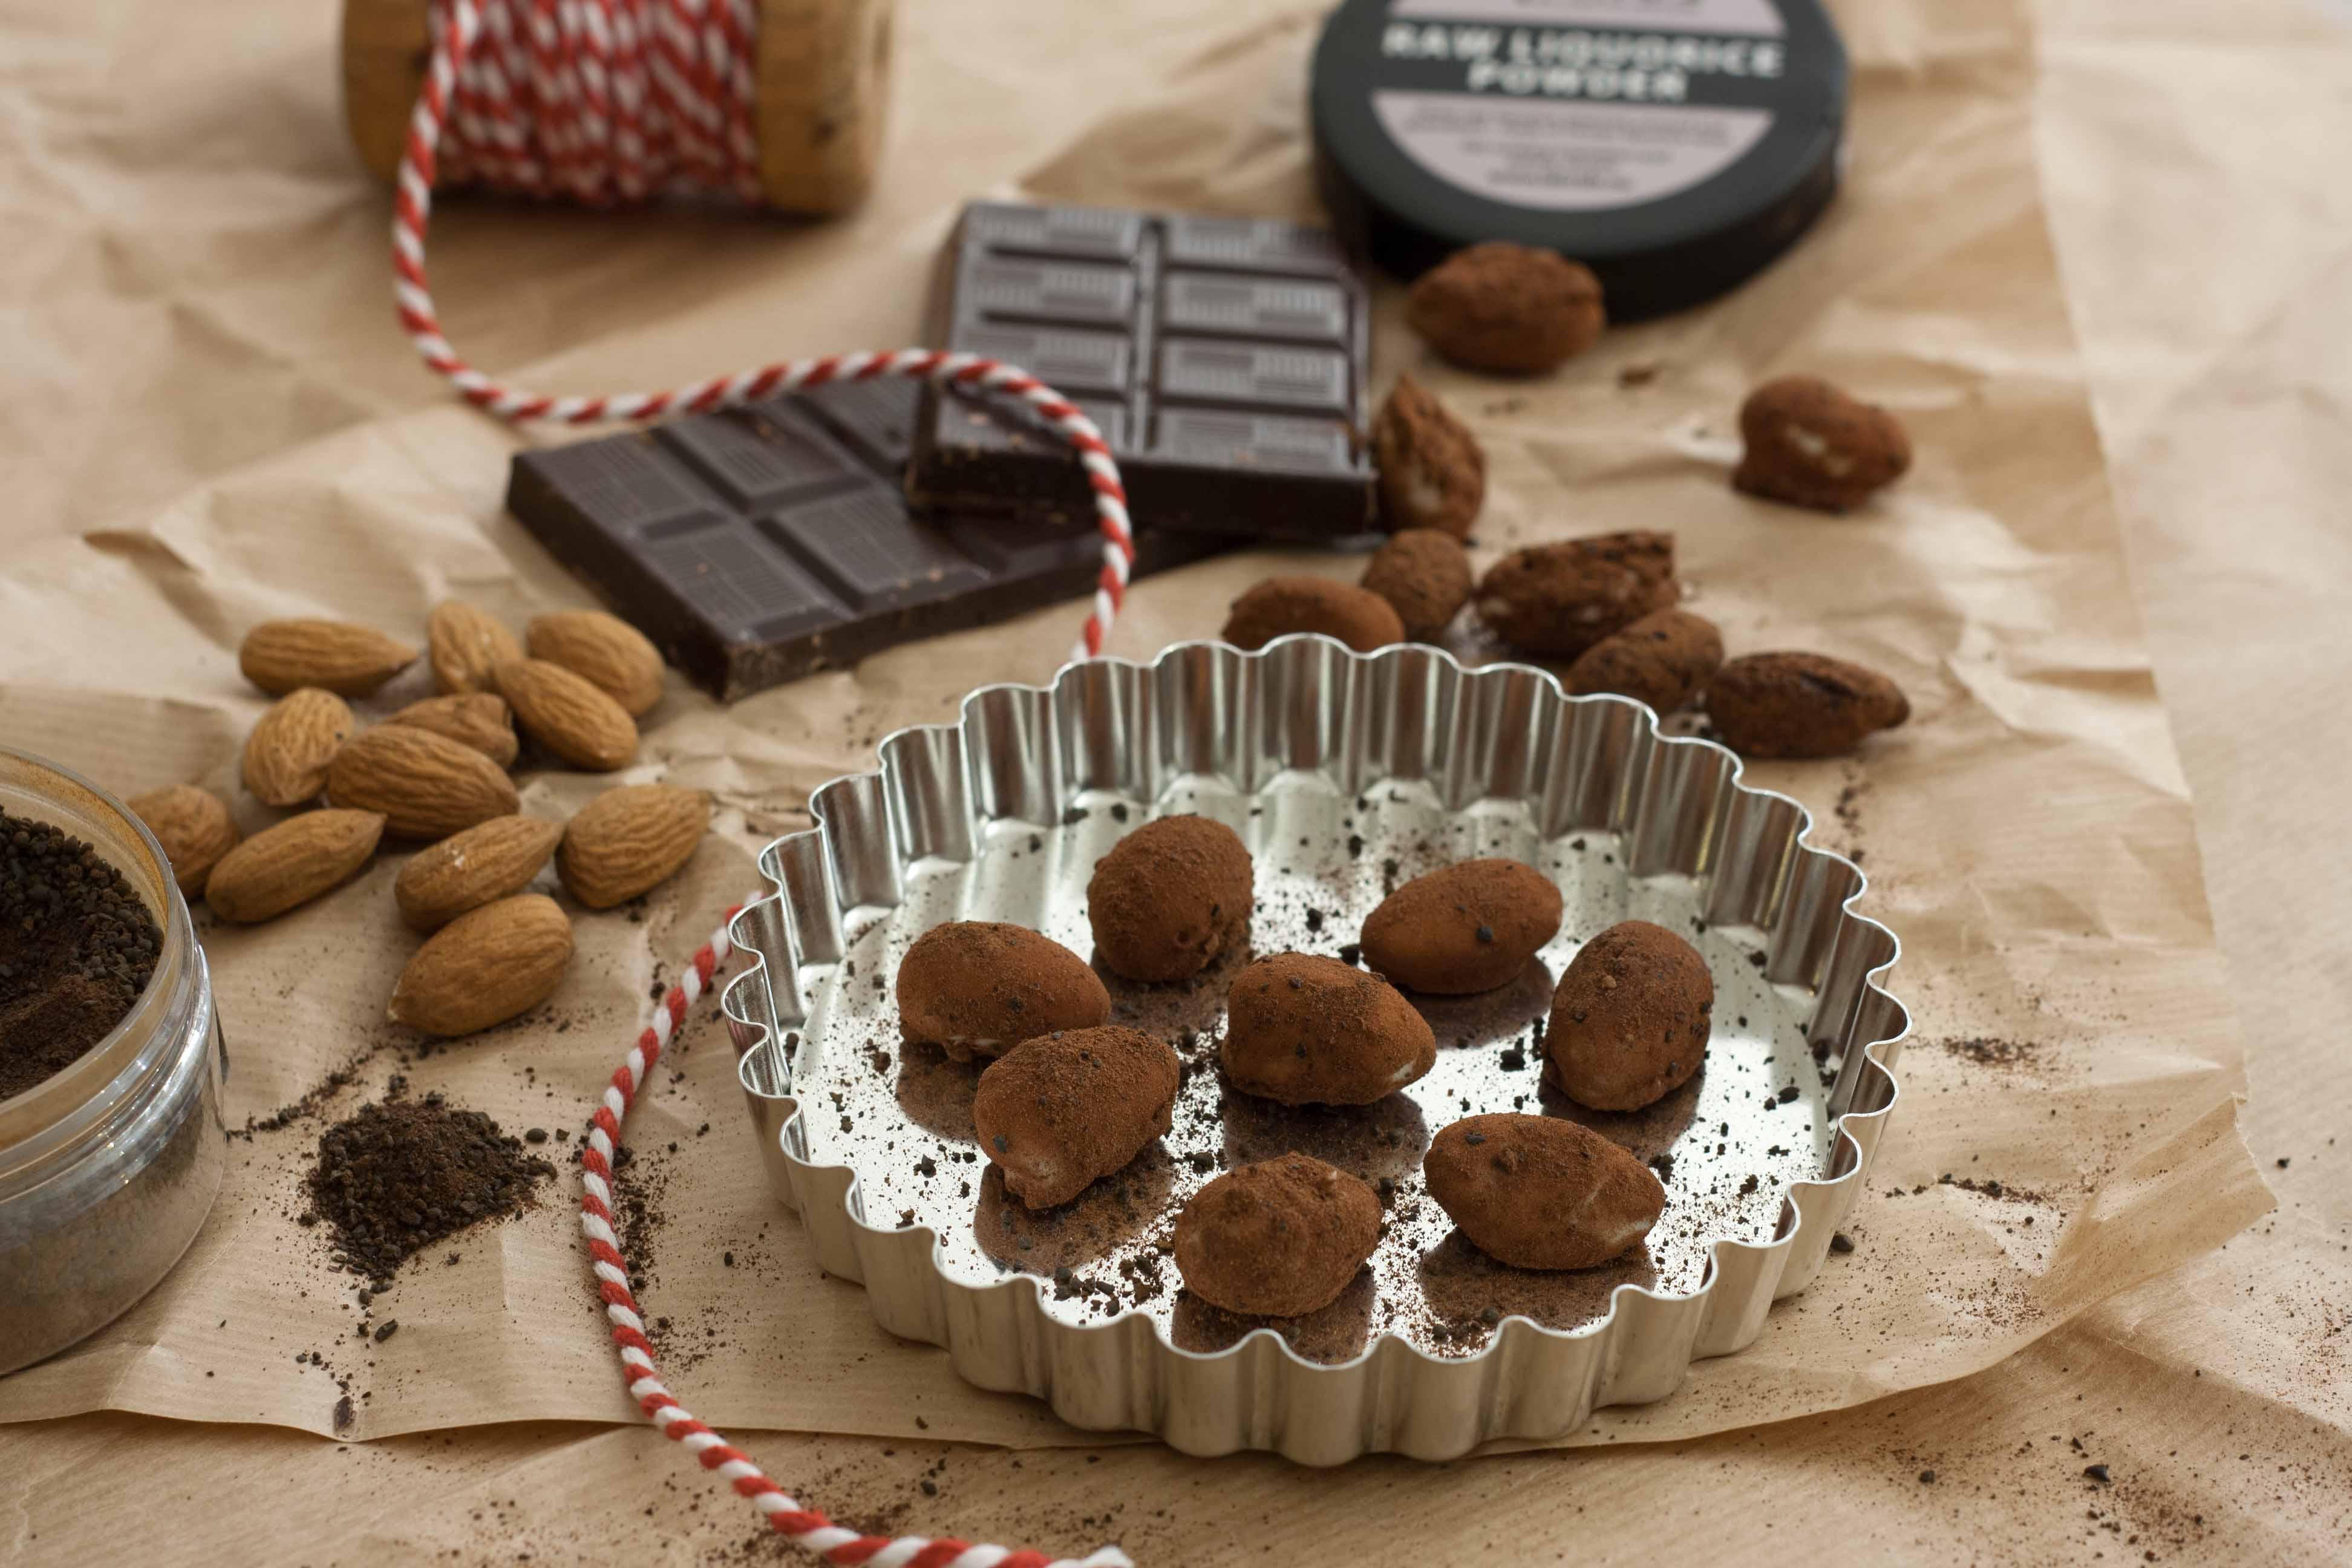 Opskrift på Hjemmelavet Chokolade Mandler med Lakrids